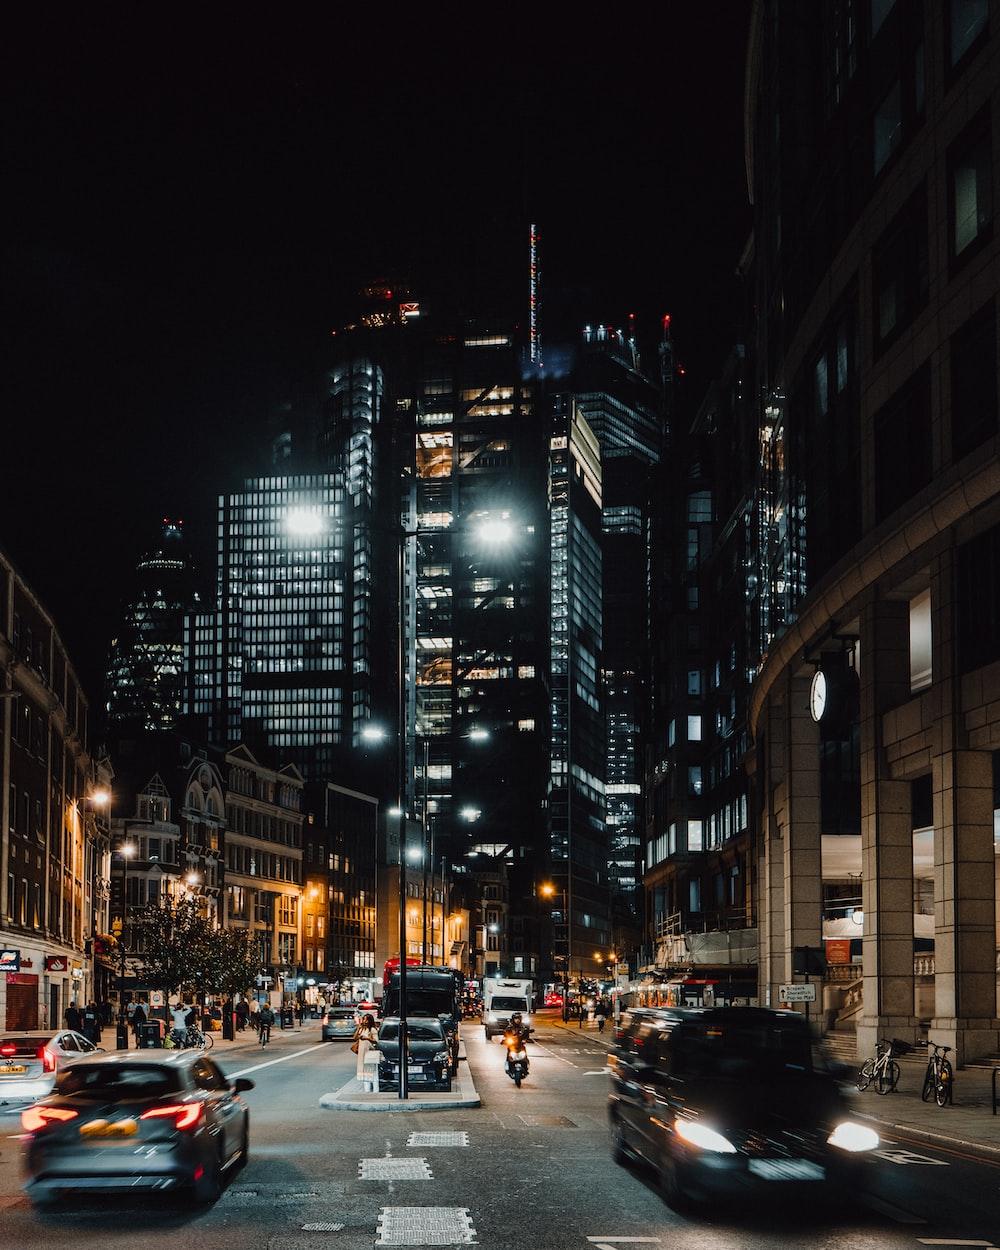 cars near high-rise buildings